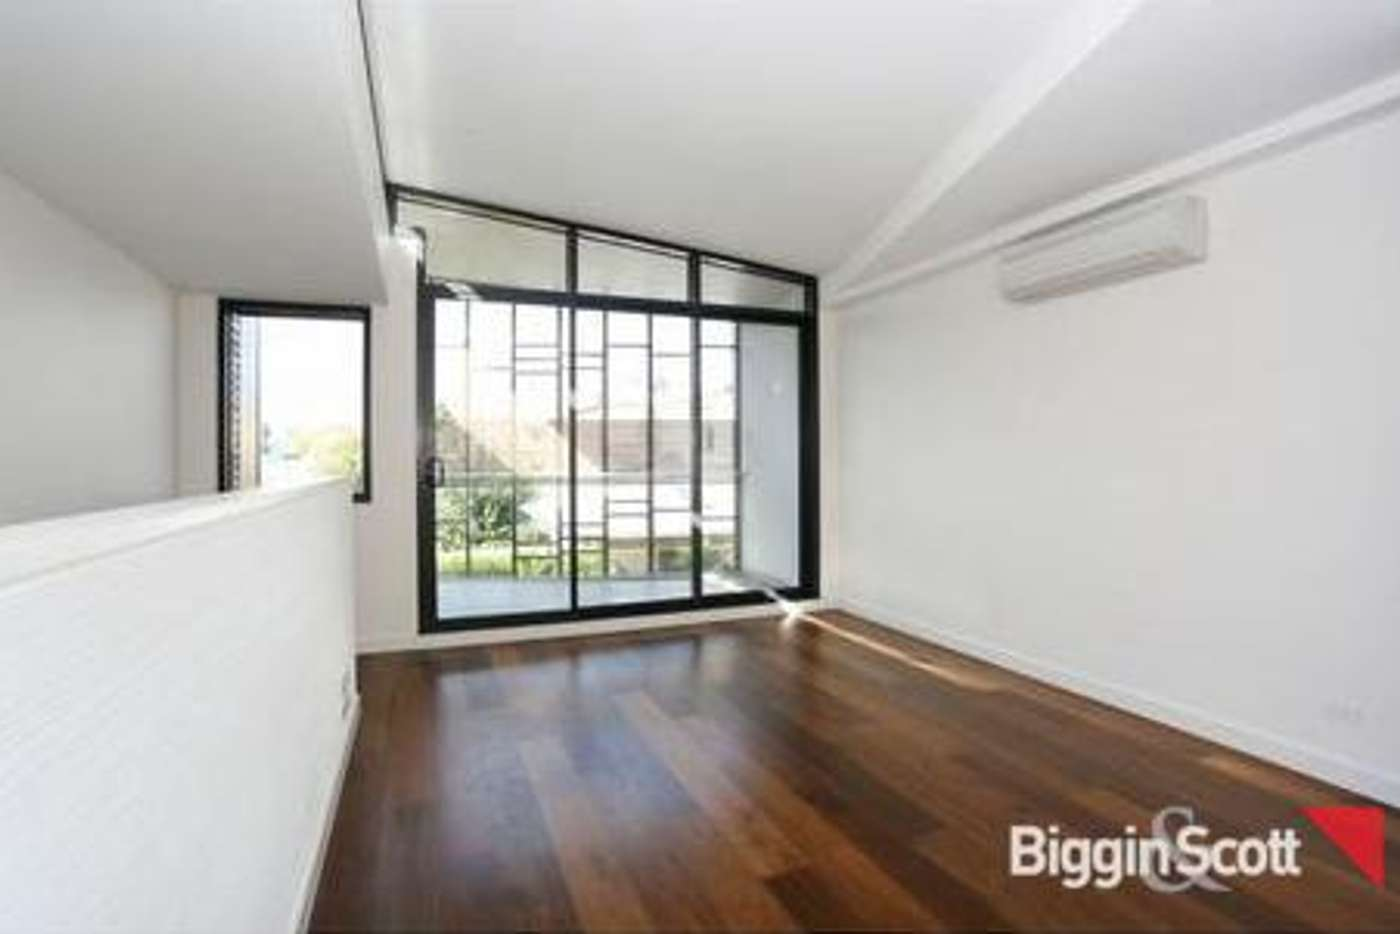 Main view of Homely apartment listing, 4/5-7 Stillman Street, Richmond VIC 3121